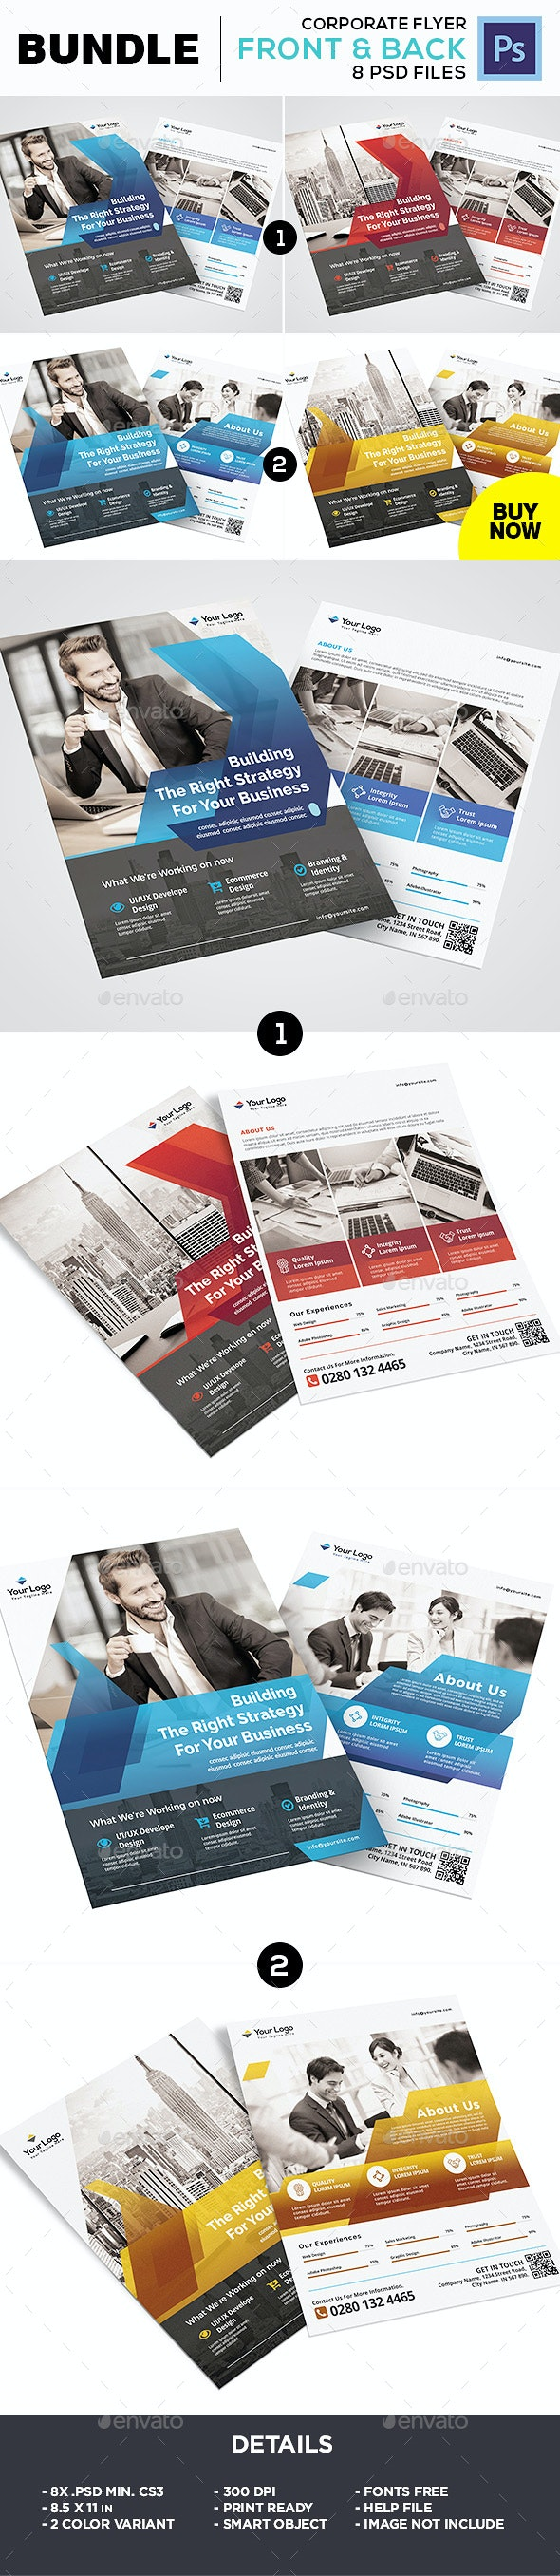 Business Flyer Bundle - Corporate Flyers